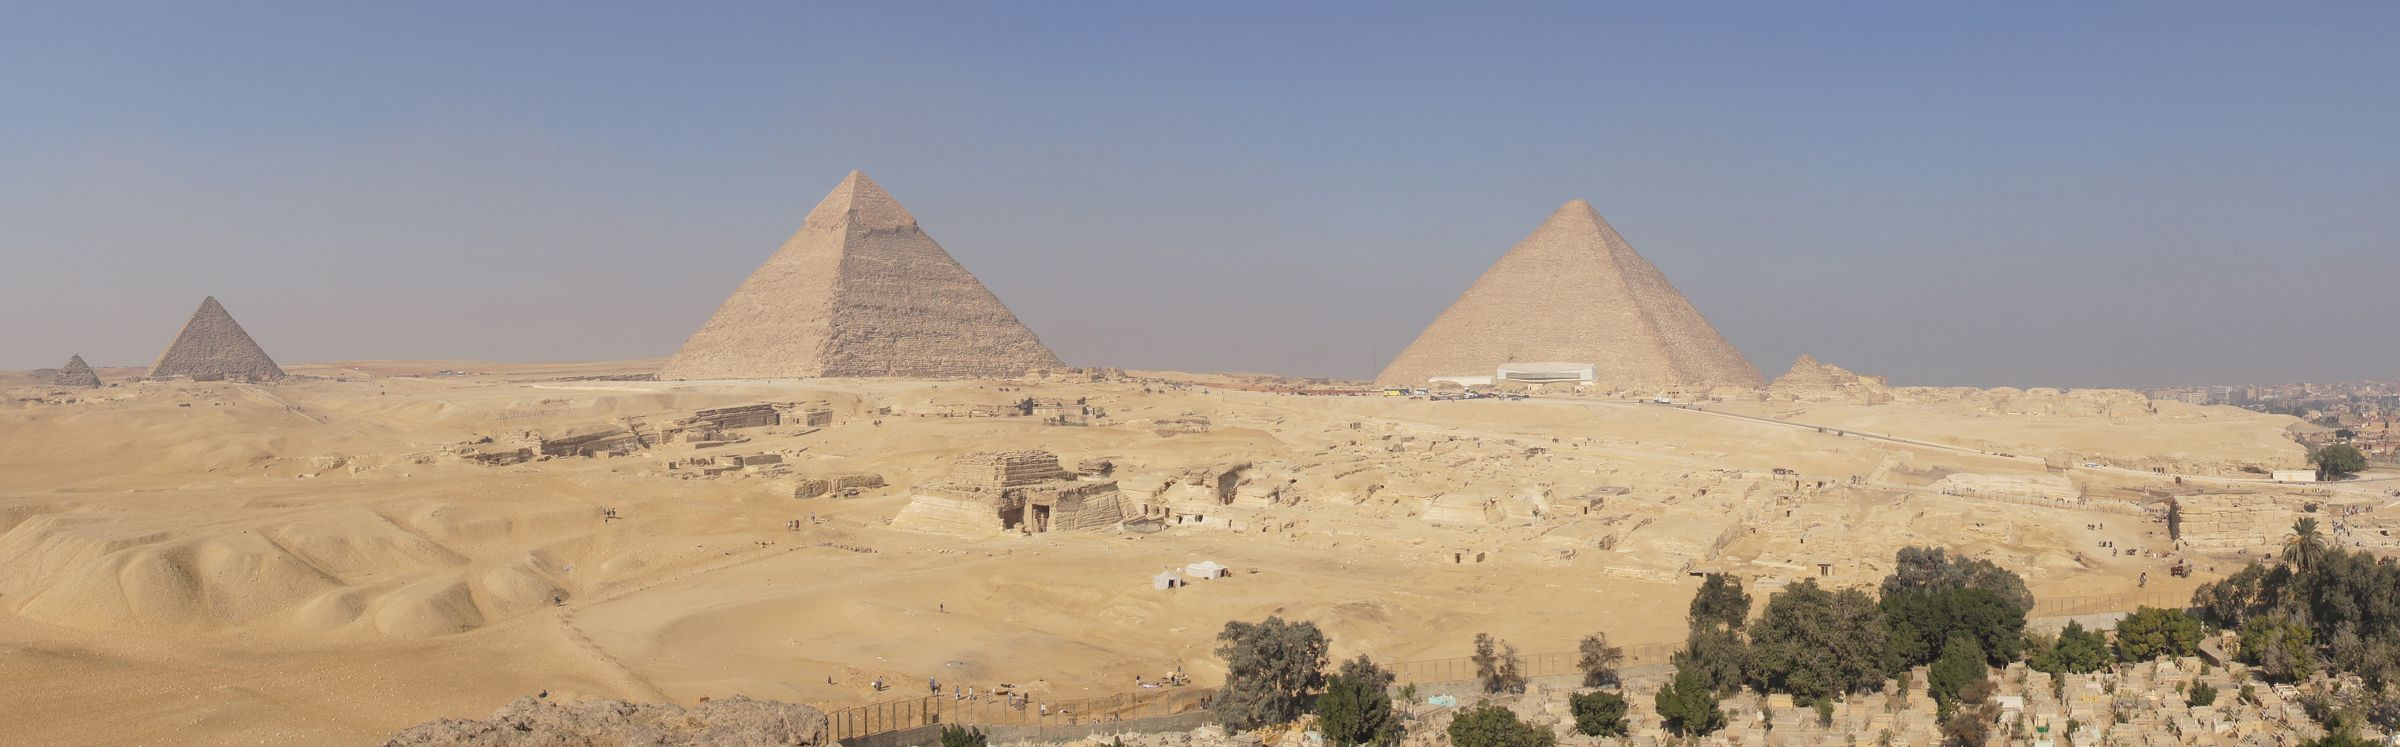 General View: Site: Giza; View: Southern Mount, Menkaure Pyramid, Khafre Pyramid, Khufu Pyramid, G 8400, Central Field